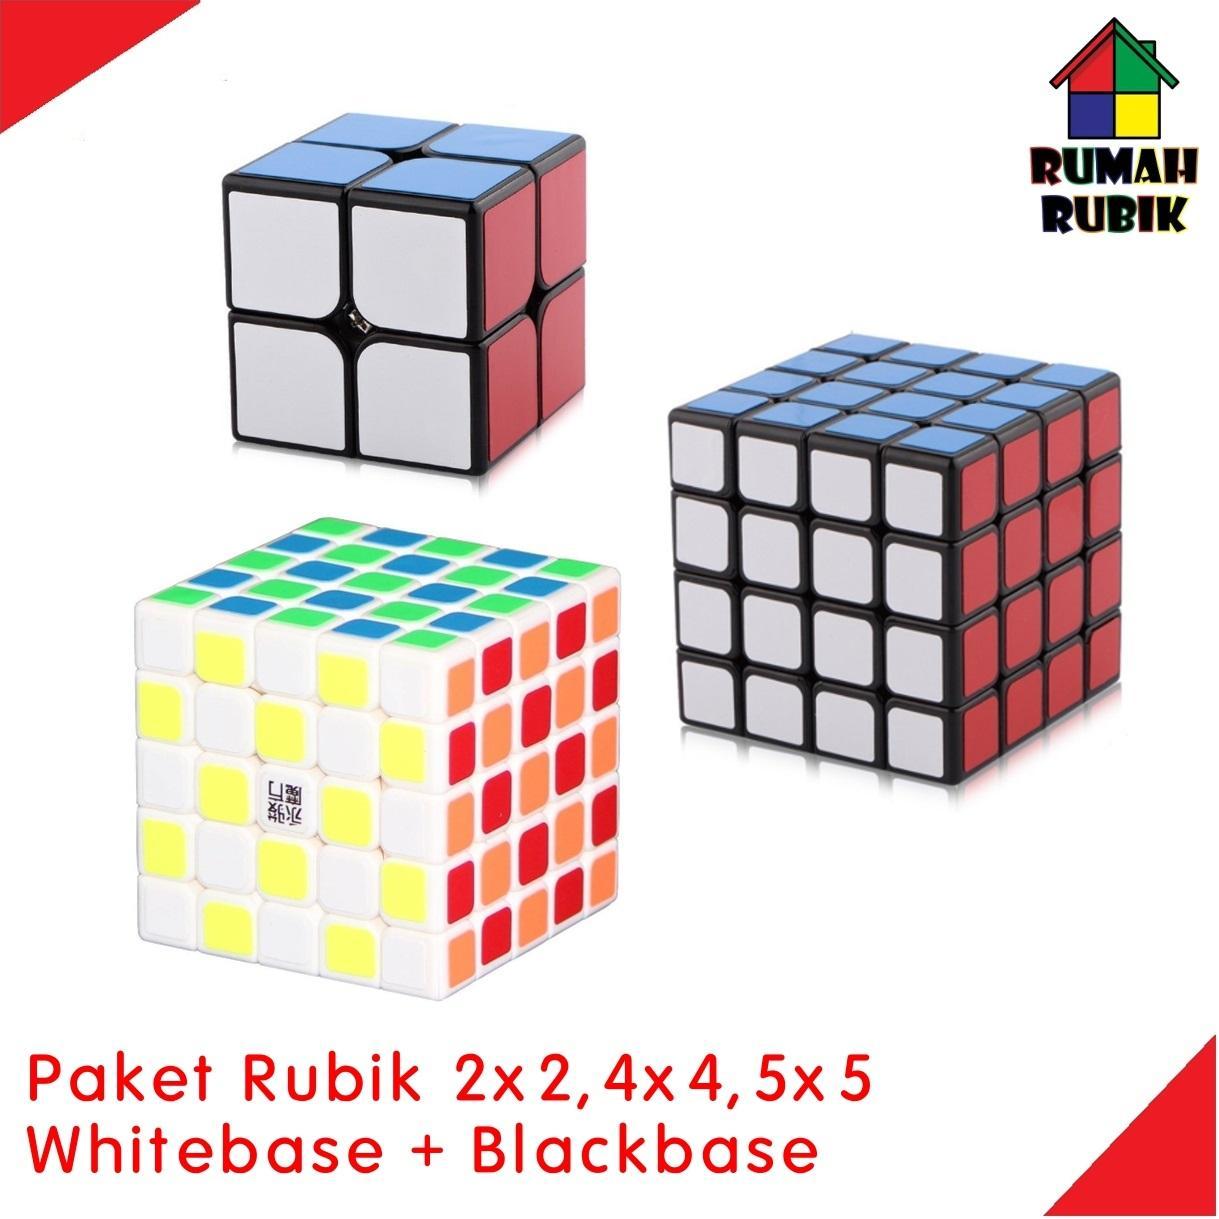 Paket Rubik YJ 2x2 Guanpo B + YJ 4x4 Guansu B + YJ 5x5 Yuchuang W